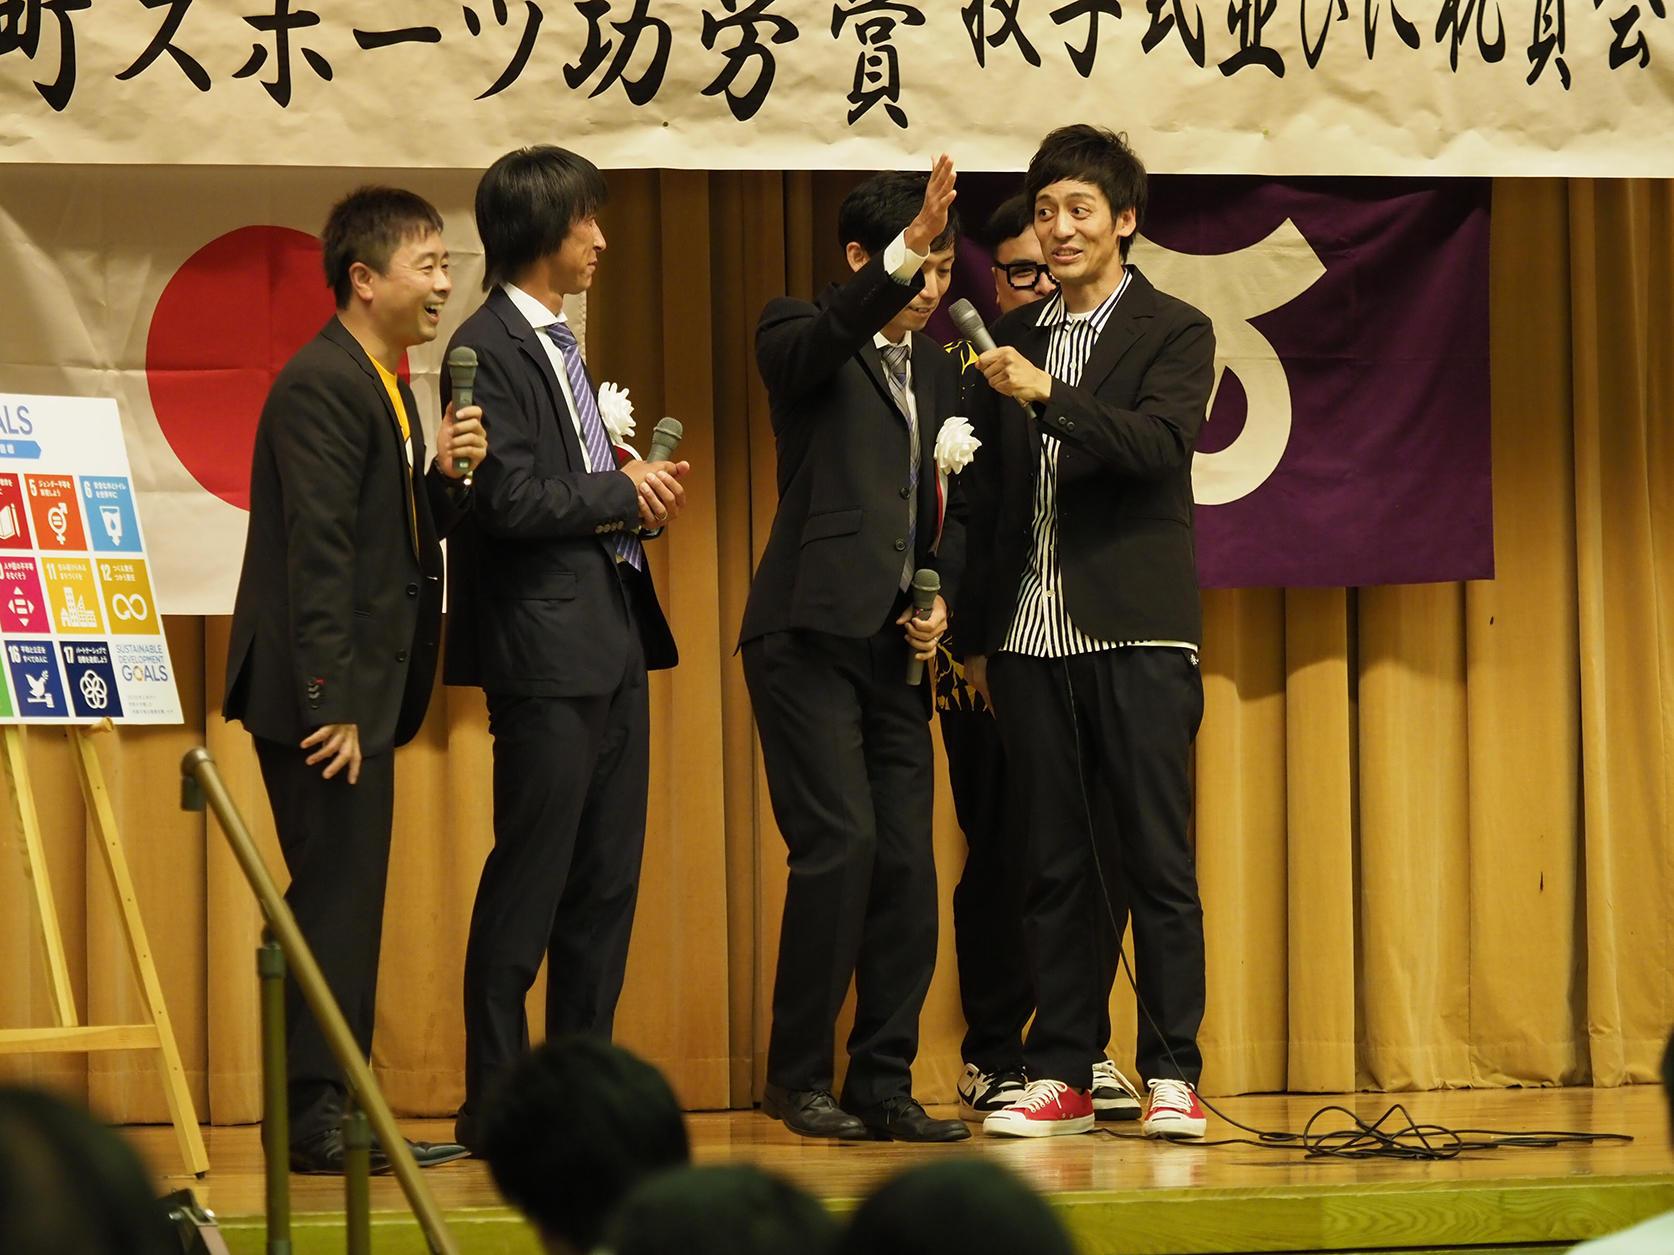 http://news.yoshimoto.co.jp/20180728172549-0ff6f7538268979723383a2a47a66ac7ed3b6d02.jpg